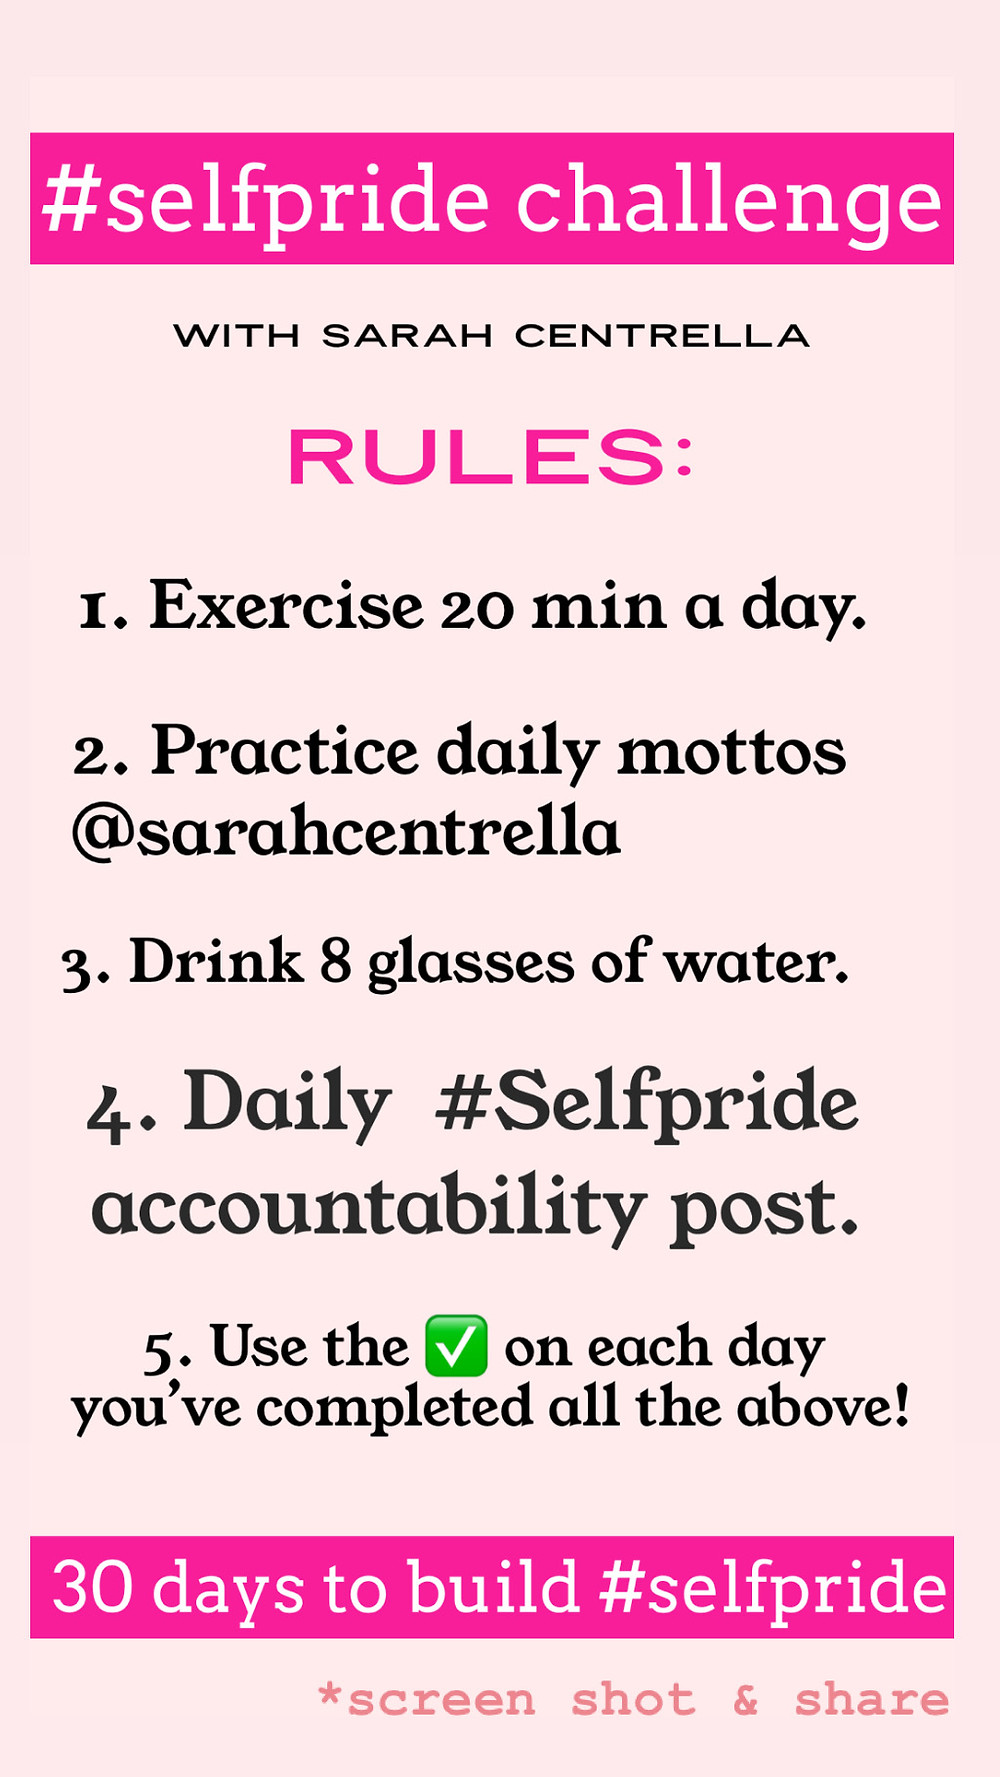 self pride challenge rules